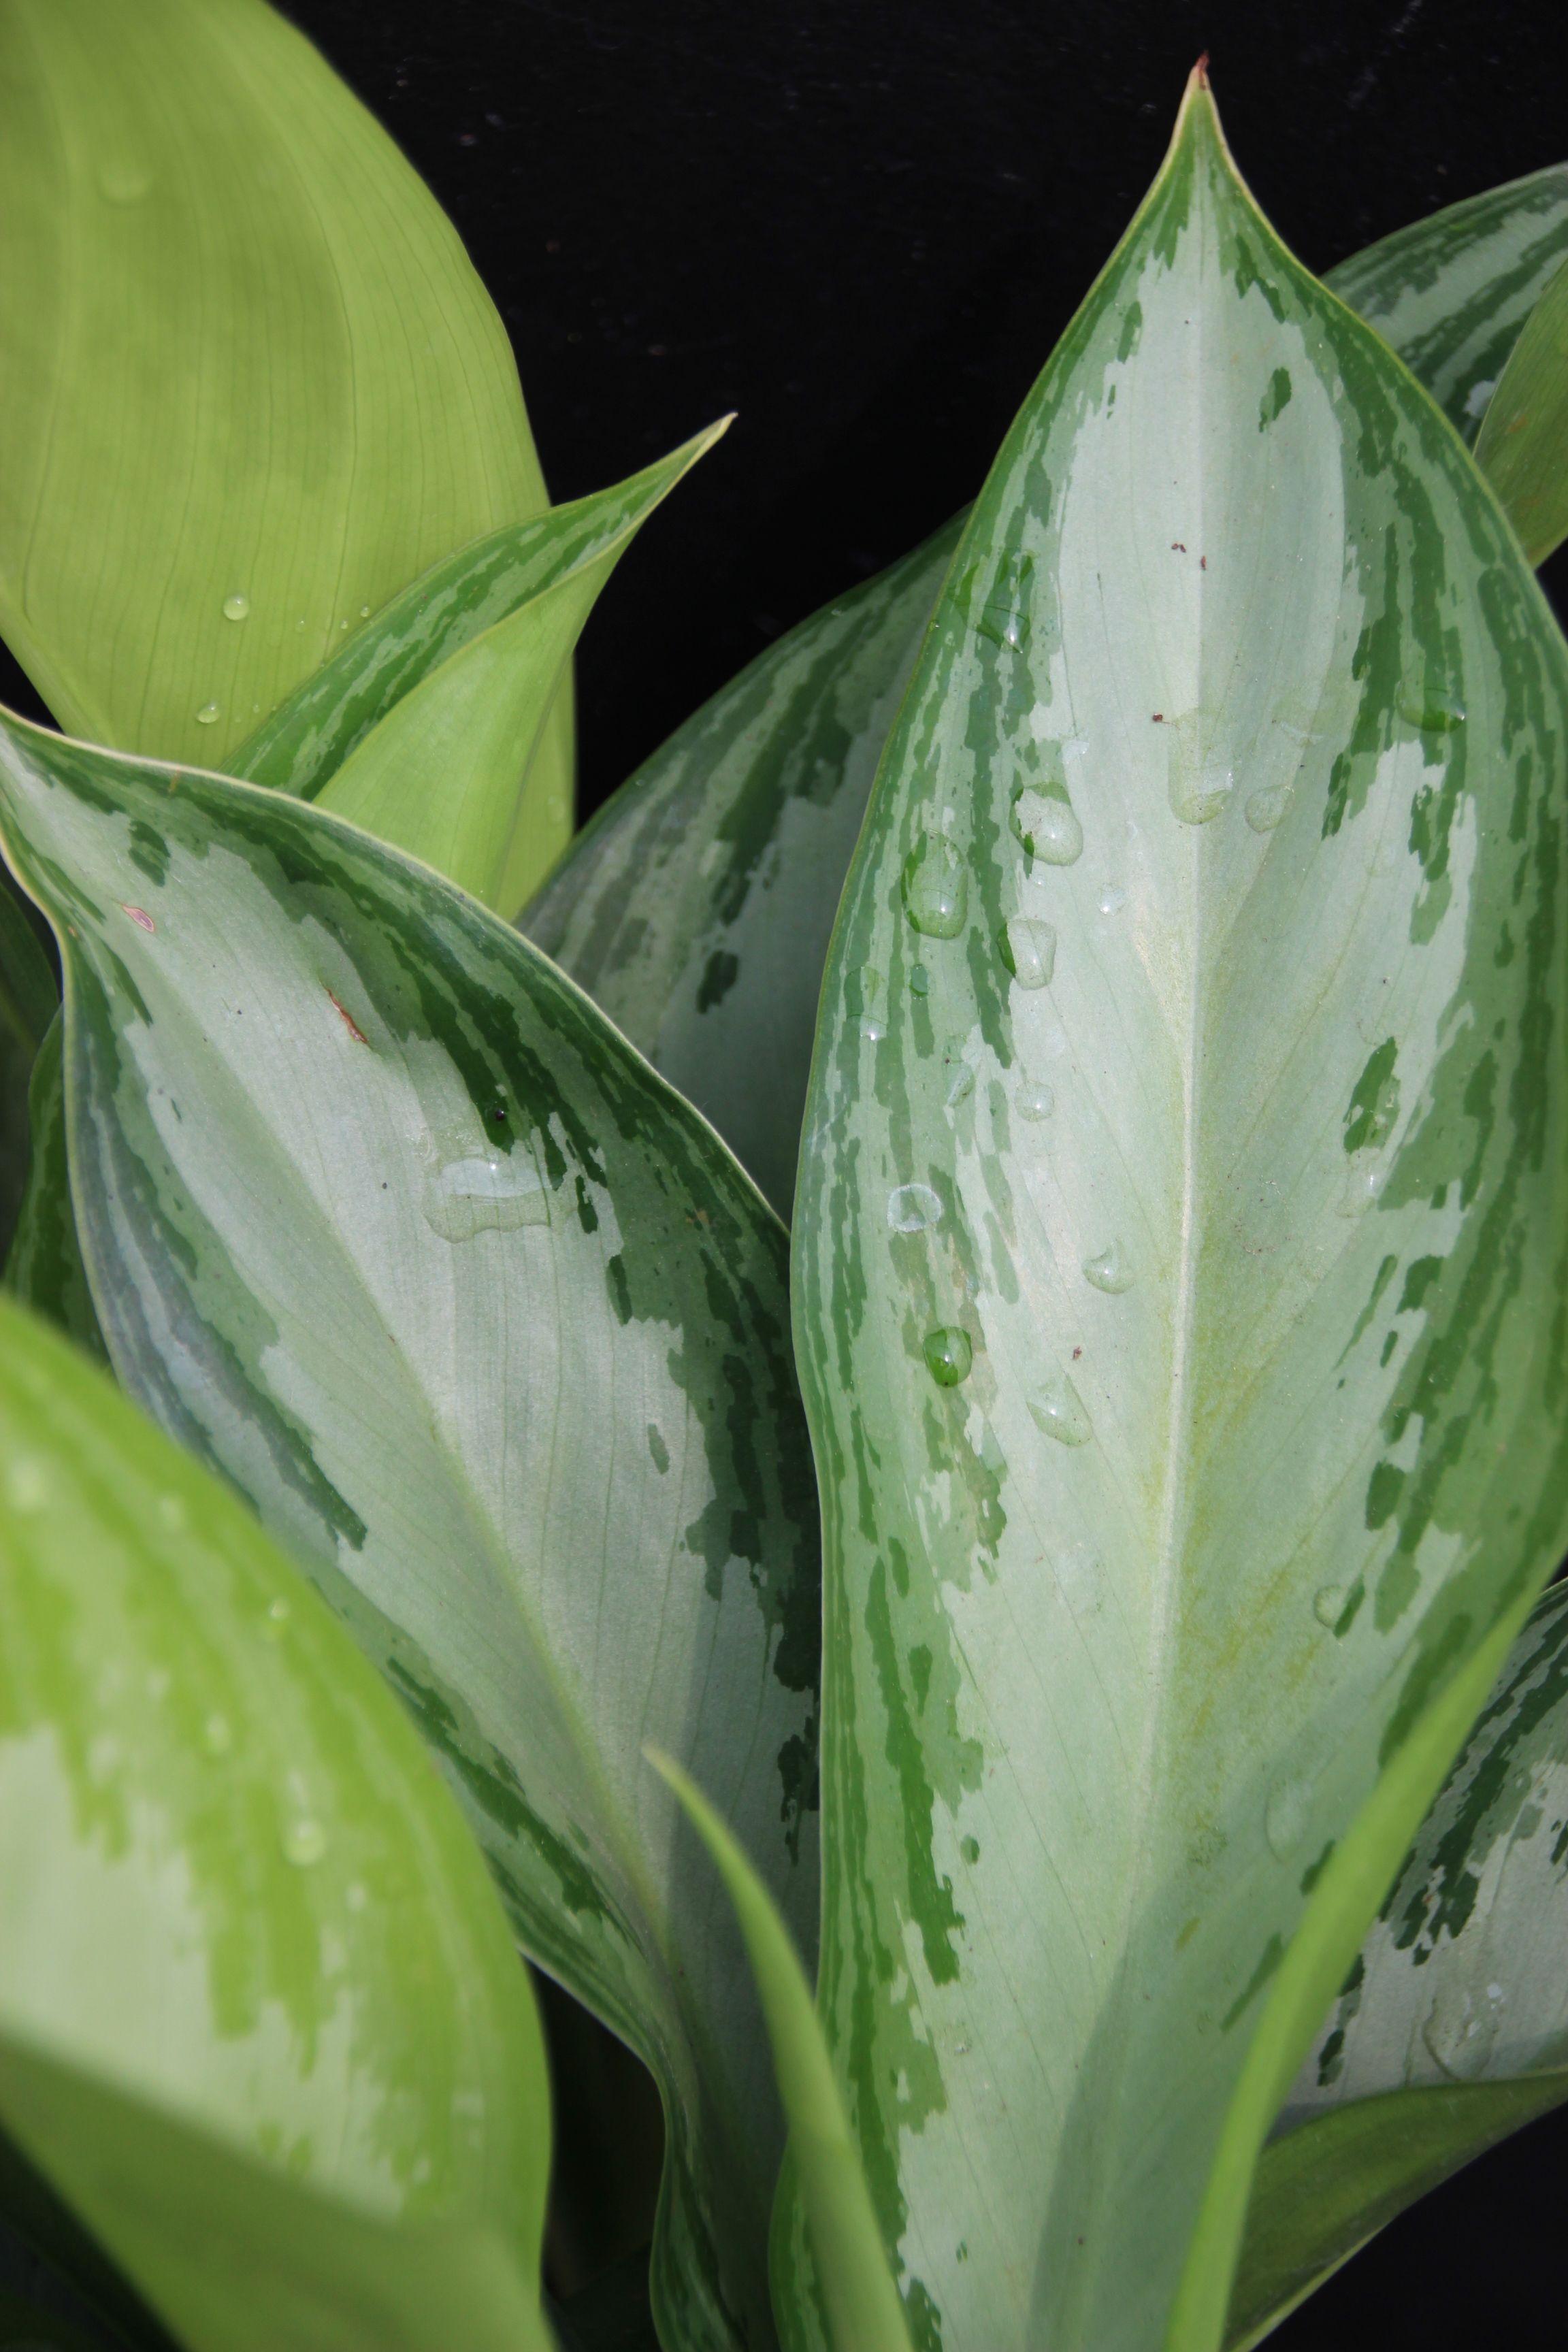 Aglaonema Growing herbs indoors, Plants